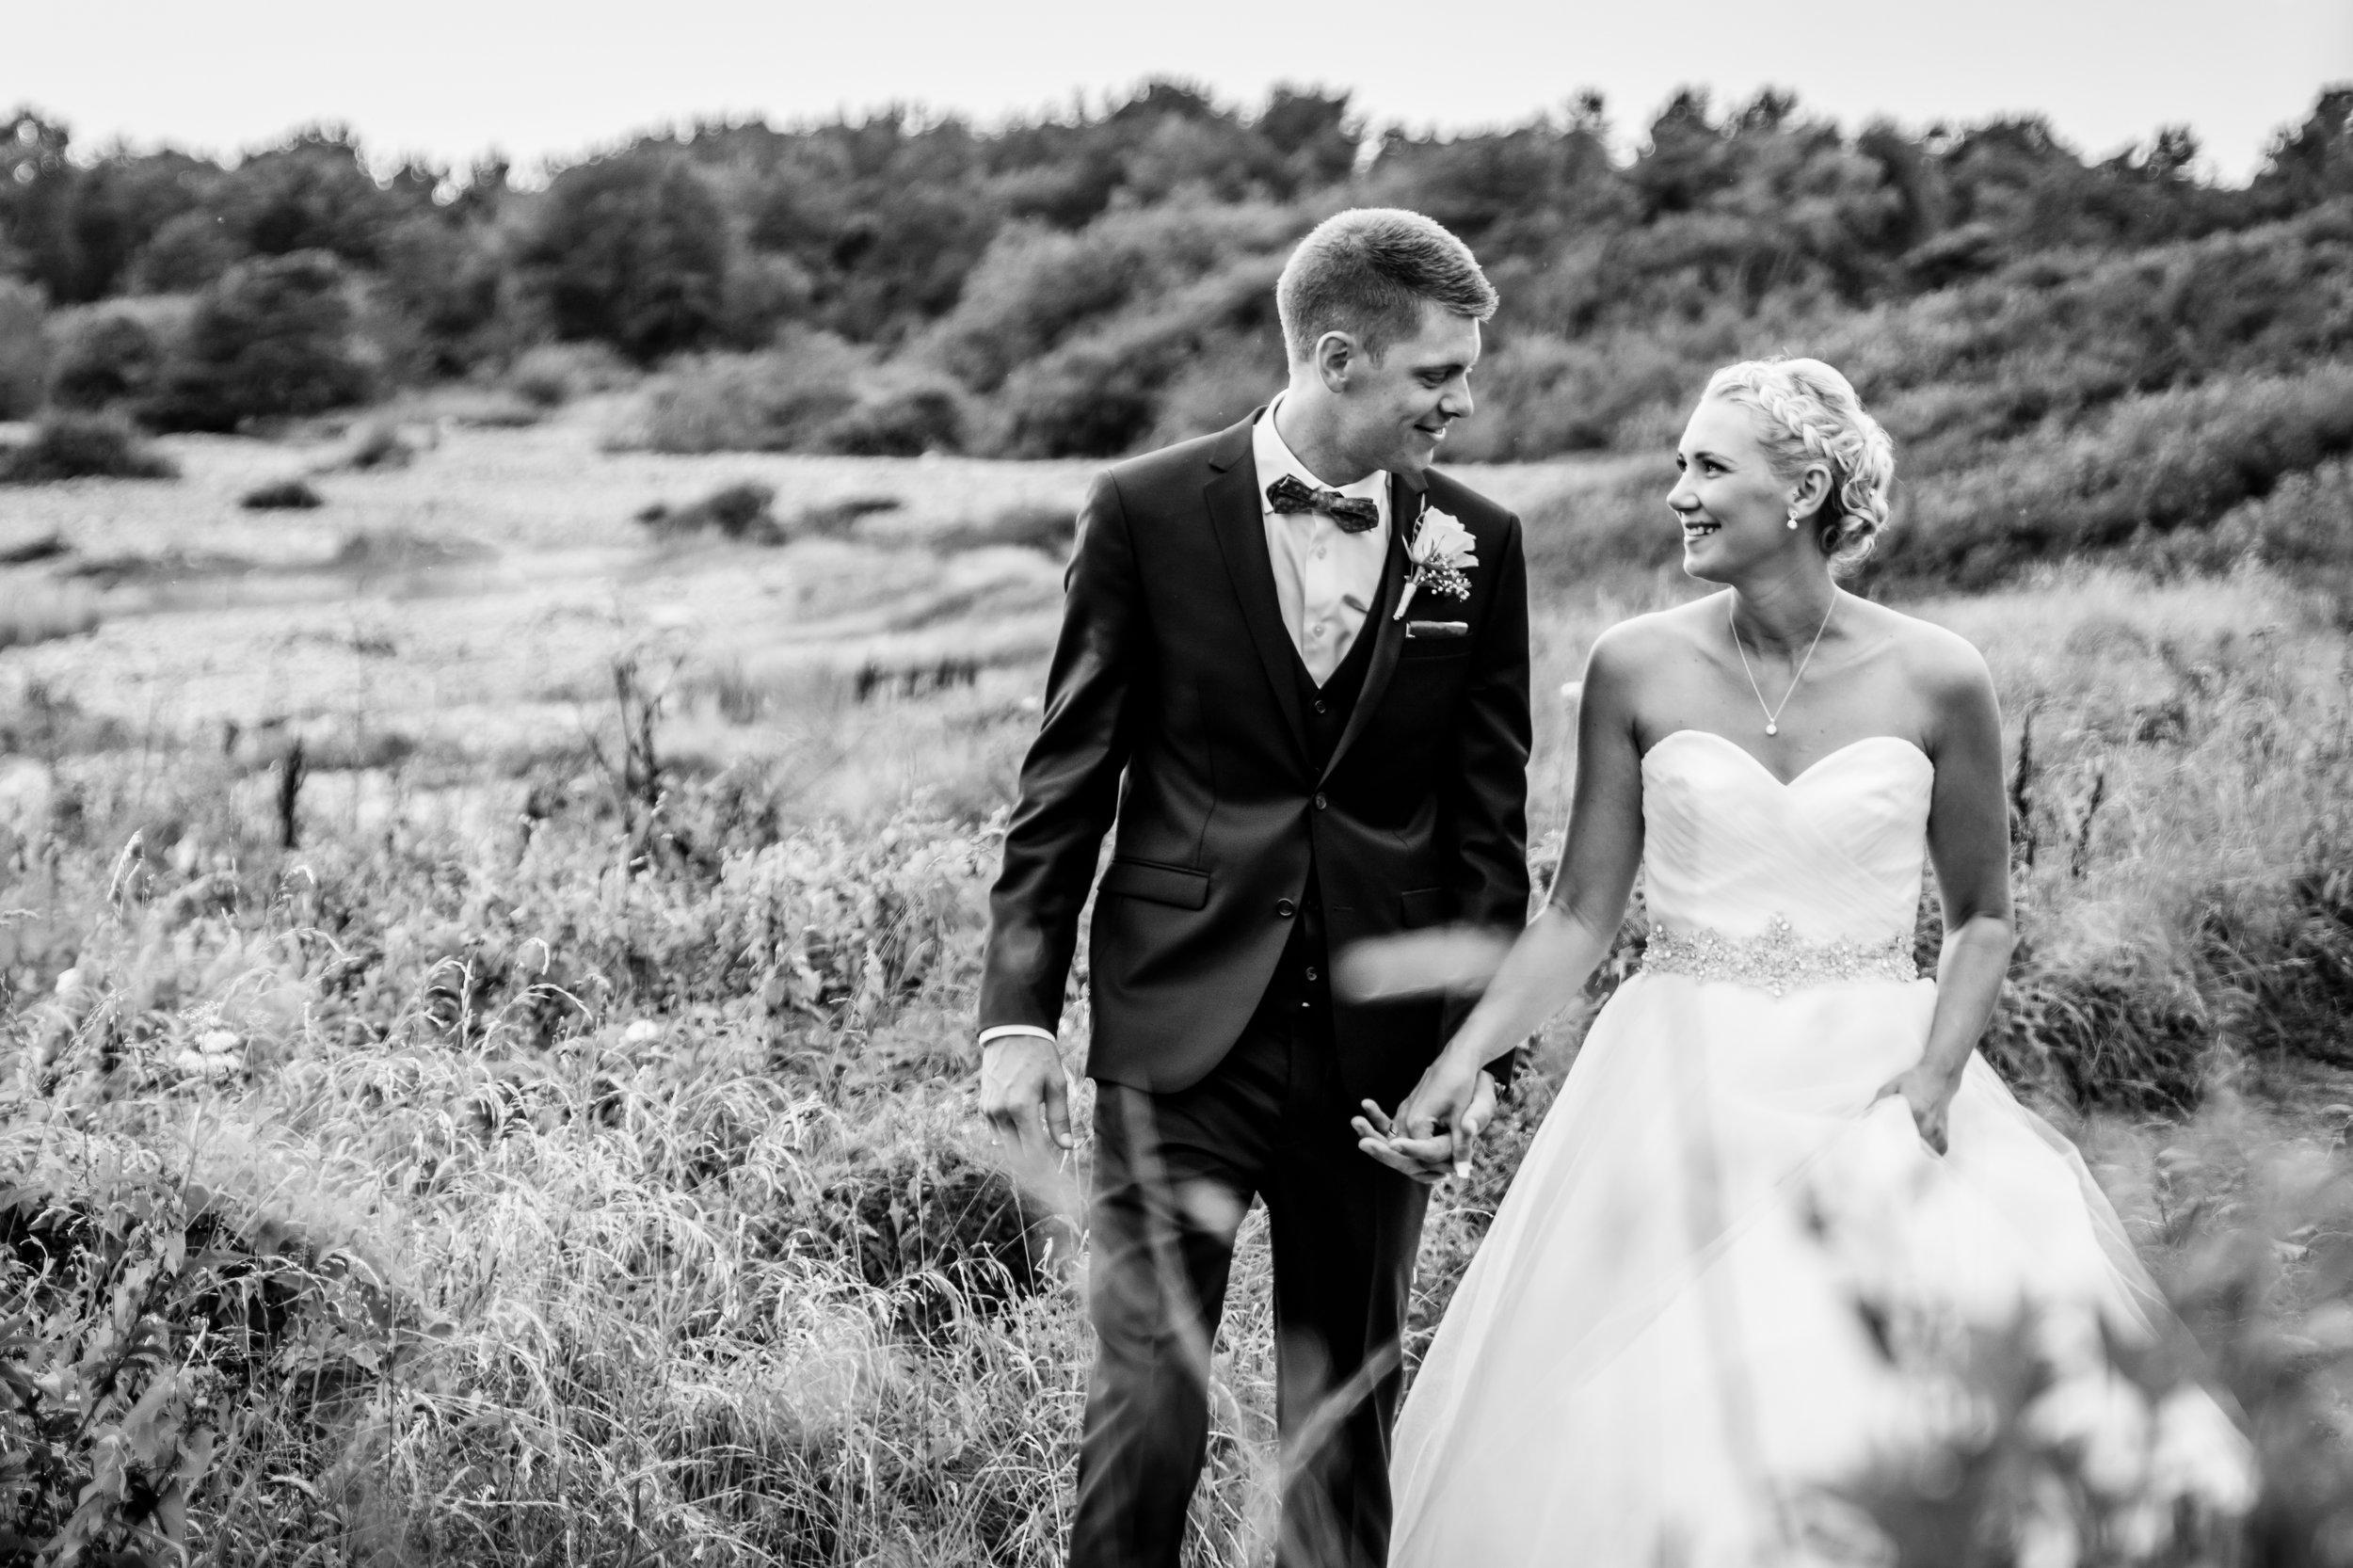 Bryllup_web1.jpg